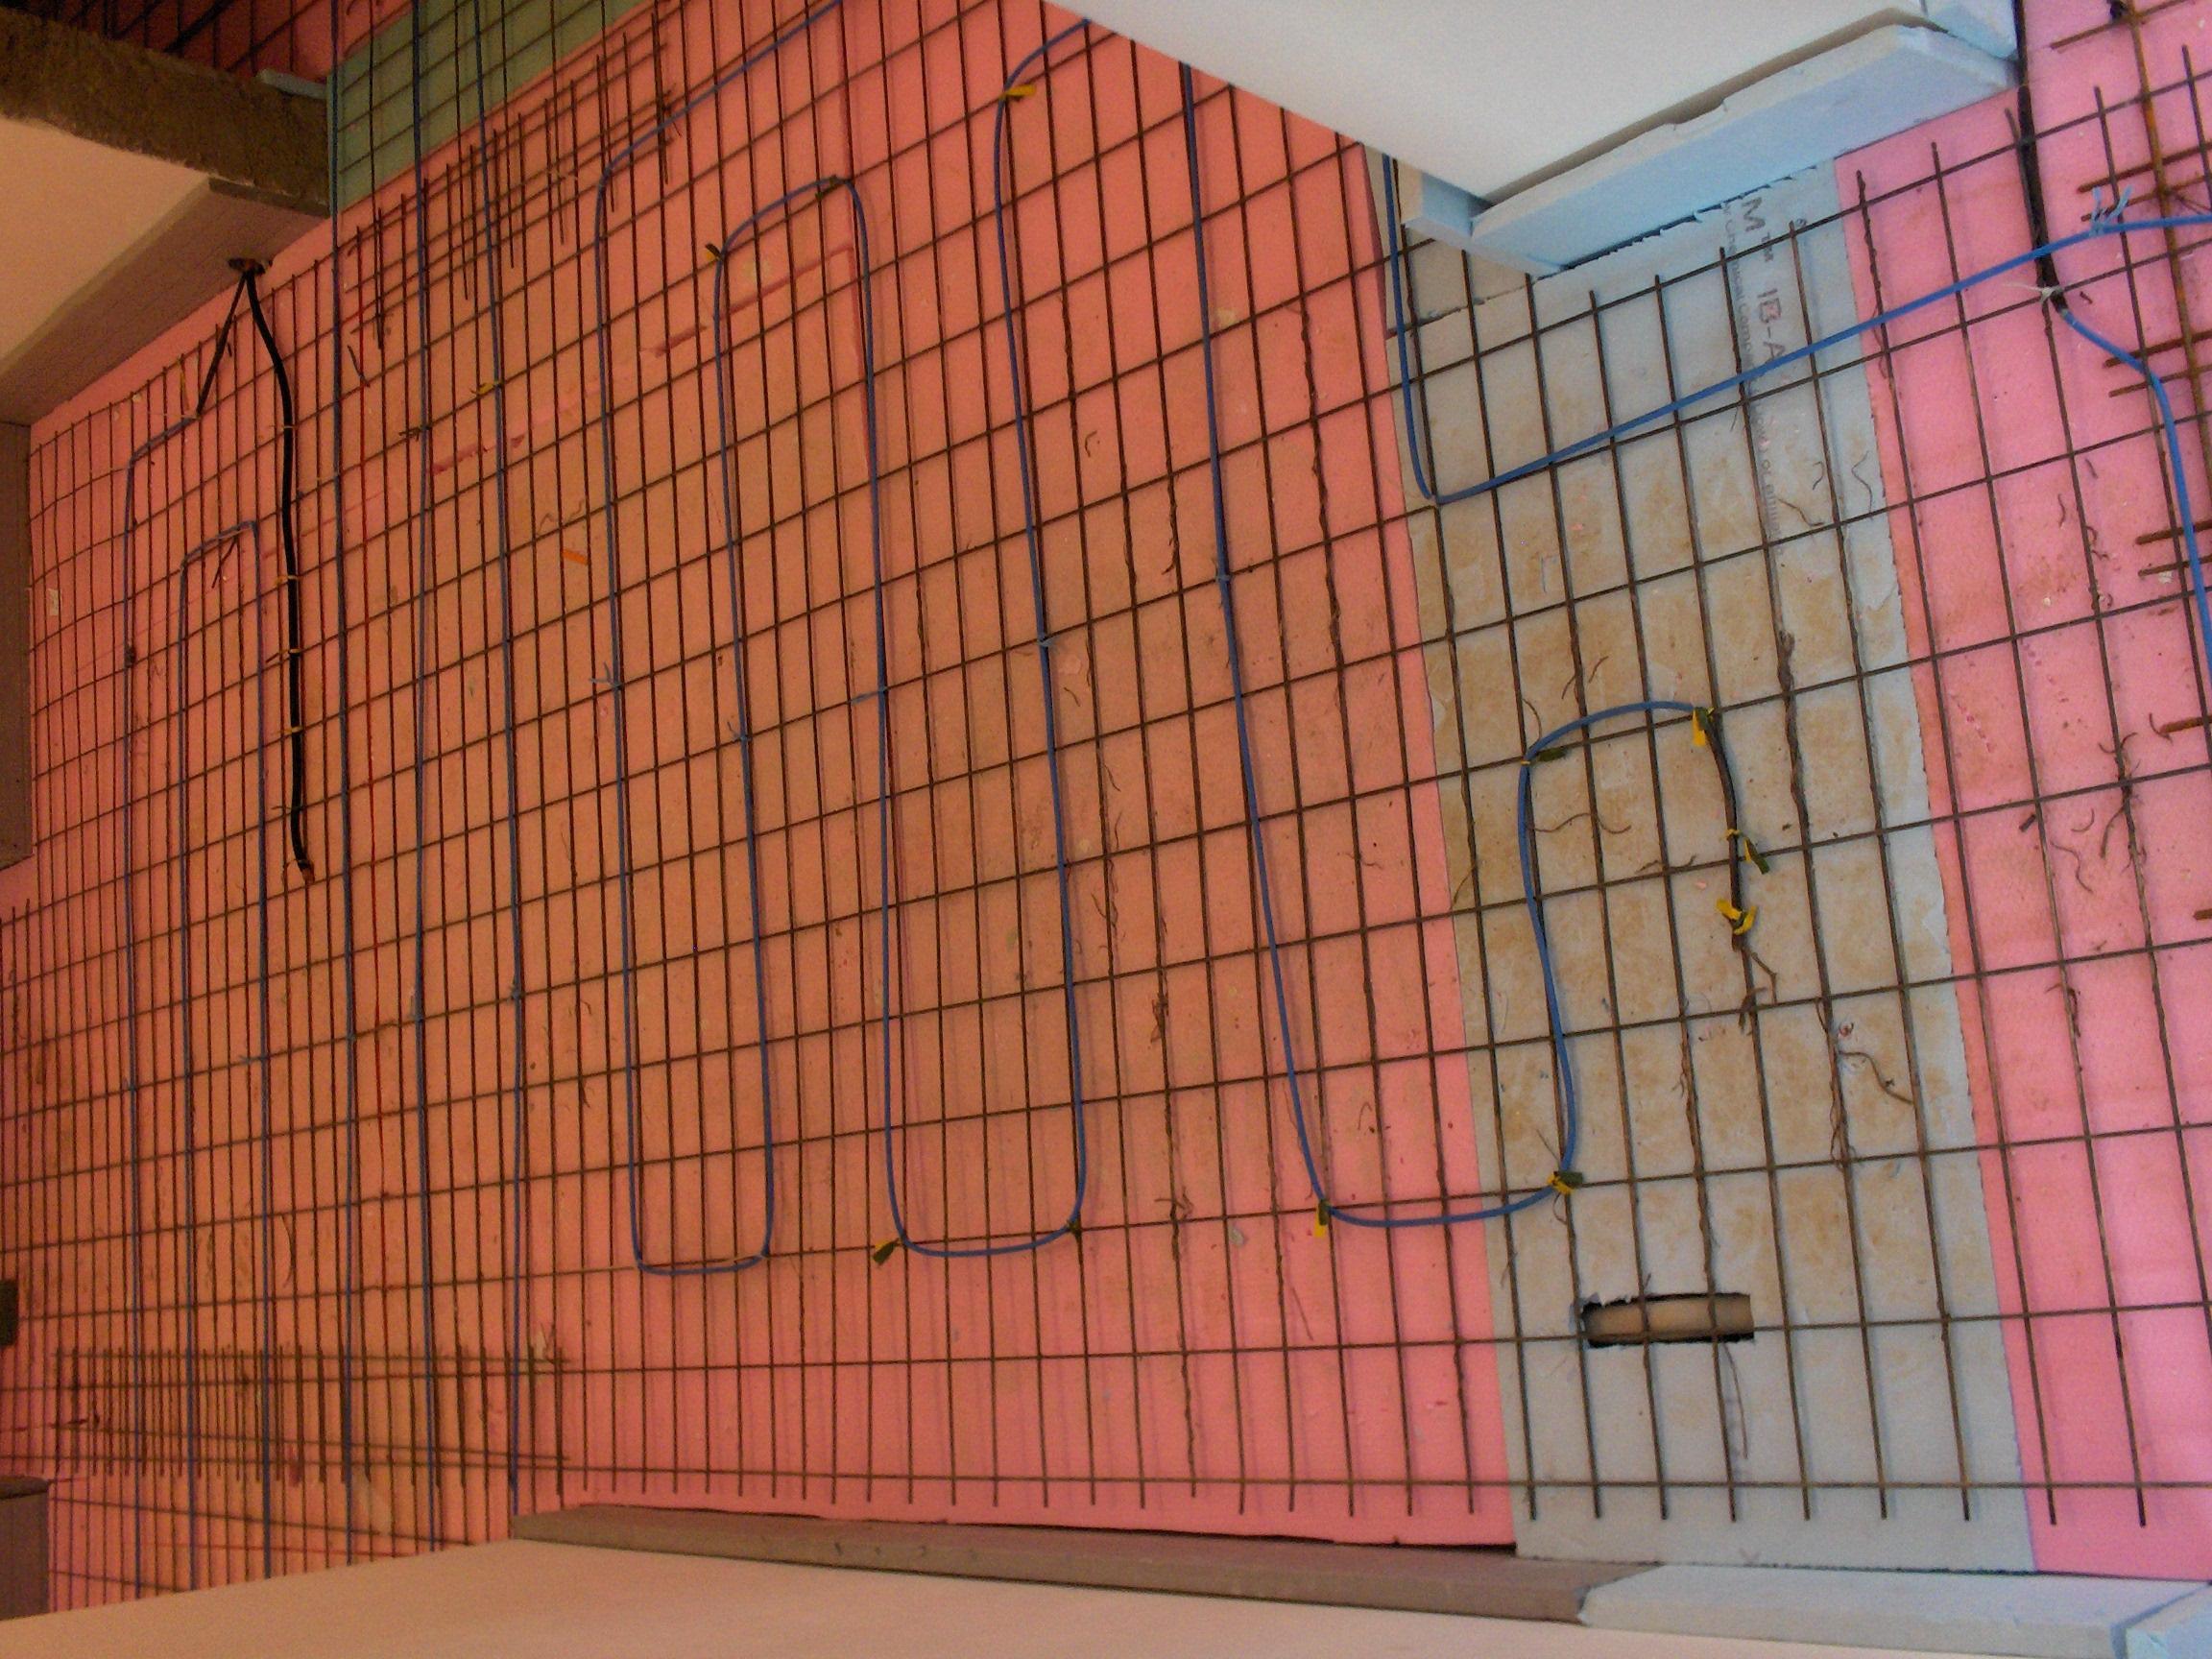 Incalzire prin pardoseala resedinta Lipia - Snagov RAYCHEM - Poza 425